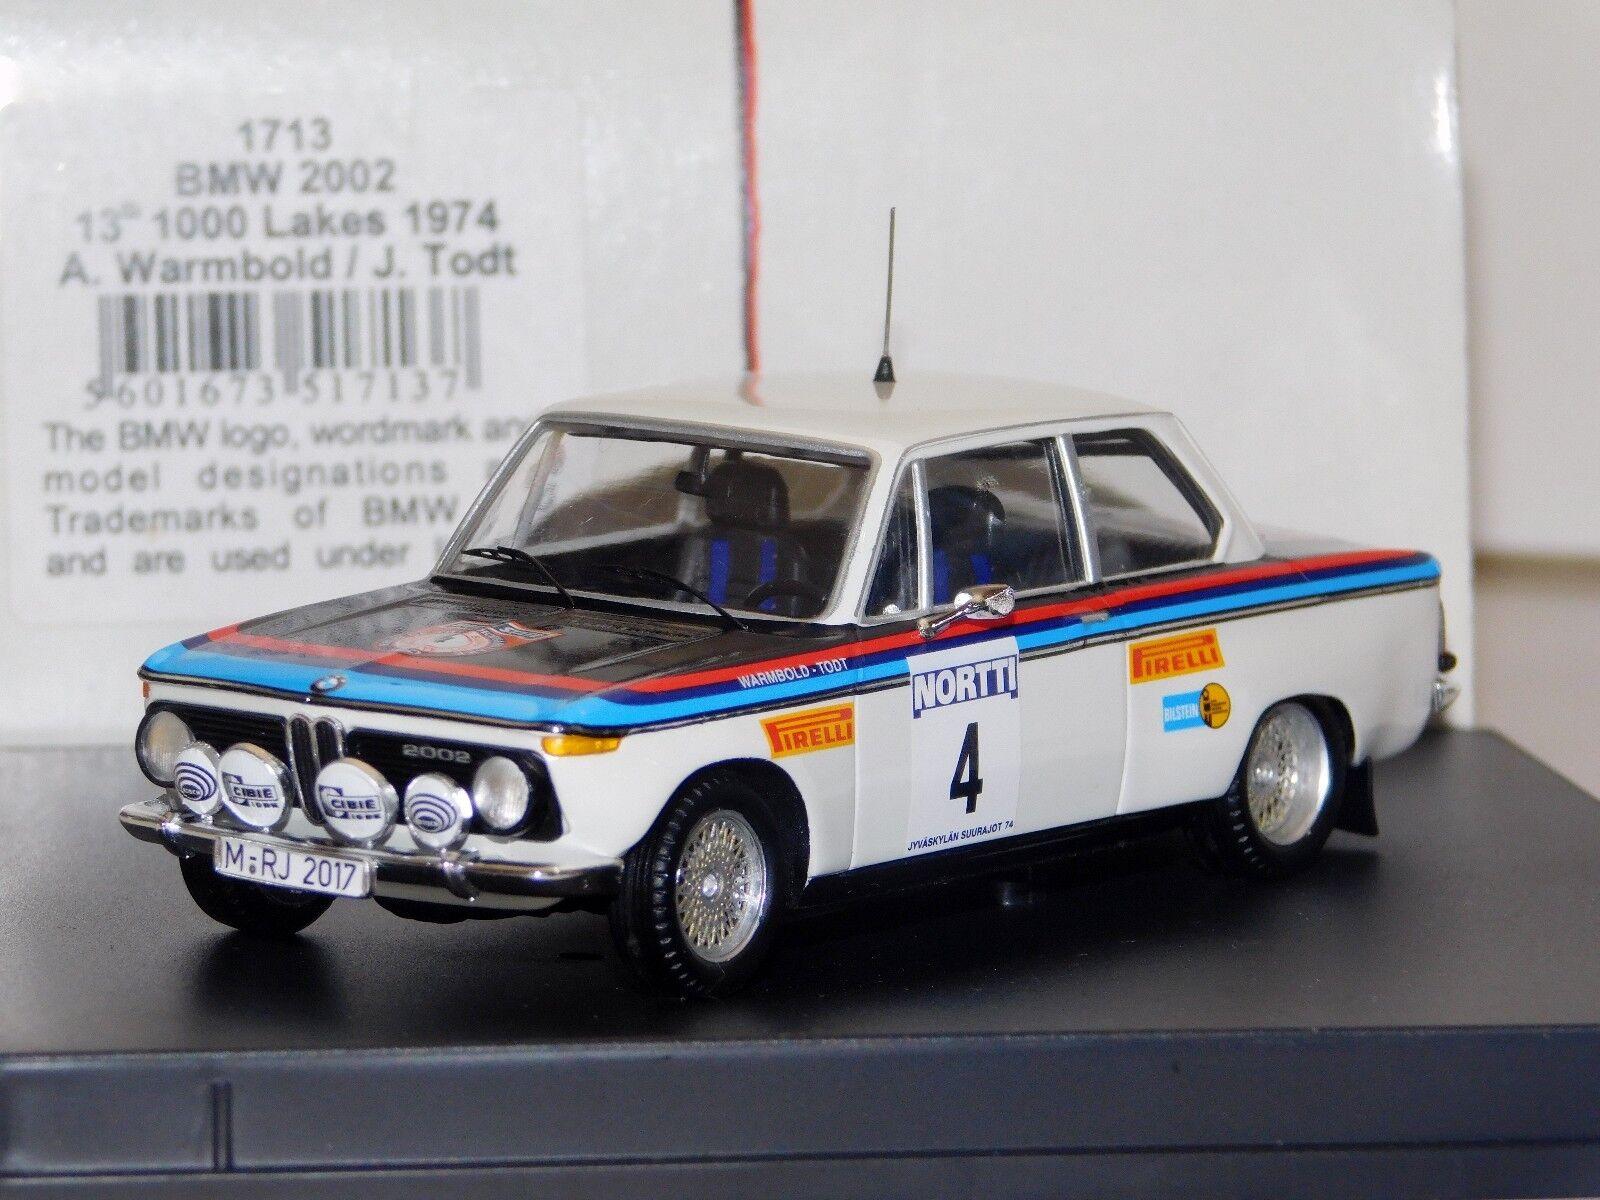 deportes calientes BMW 2002  4 Warmbold 1000 Lagos Rally 1974 Trofeu Trofeu Trofeu 1713 1 43  entrega rápida